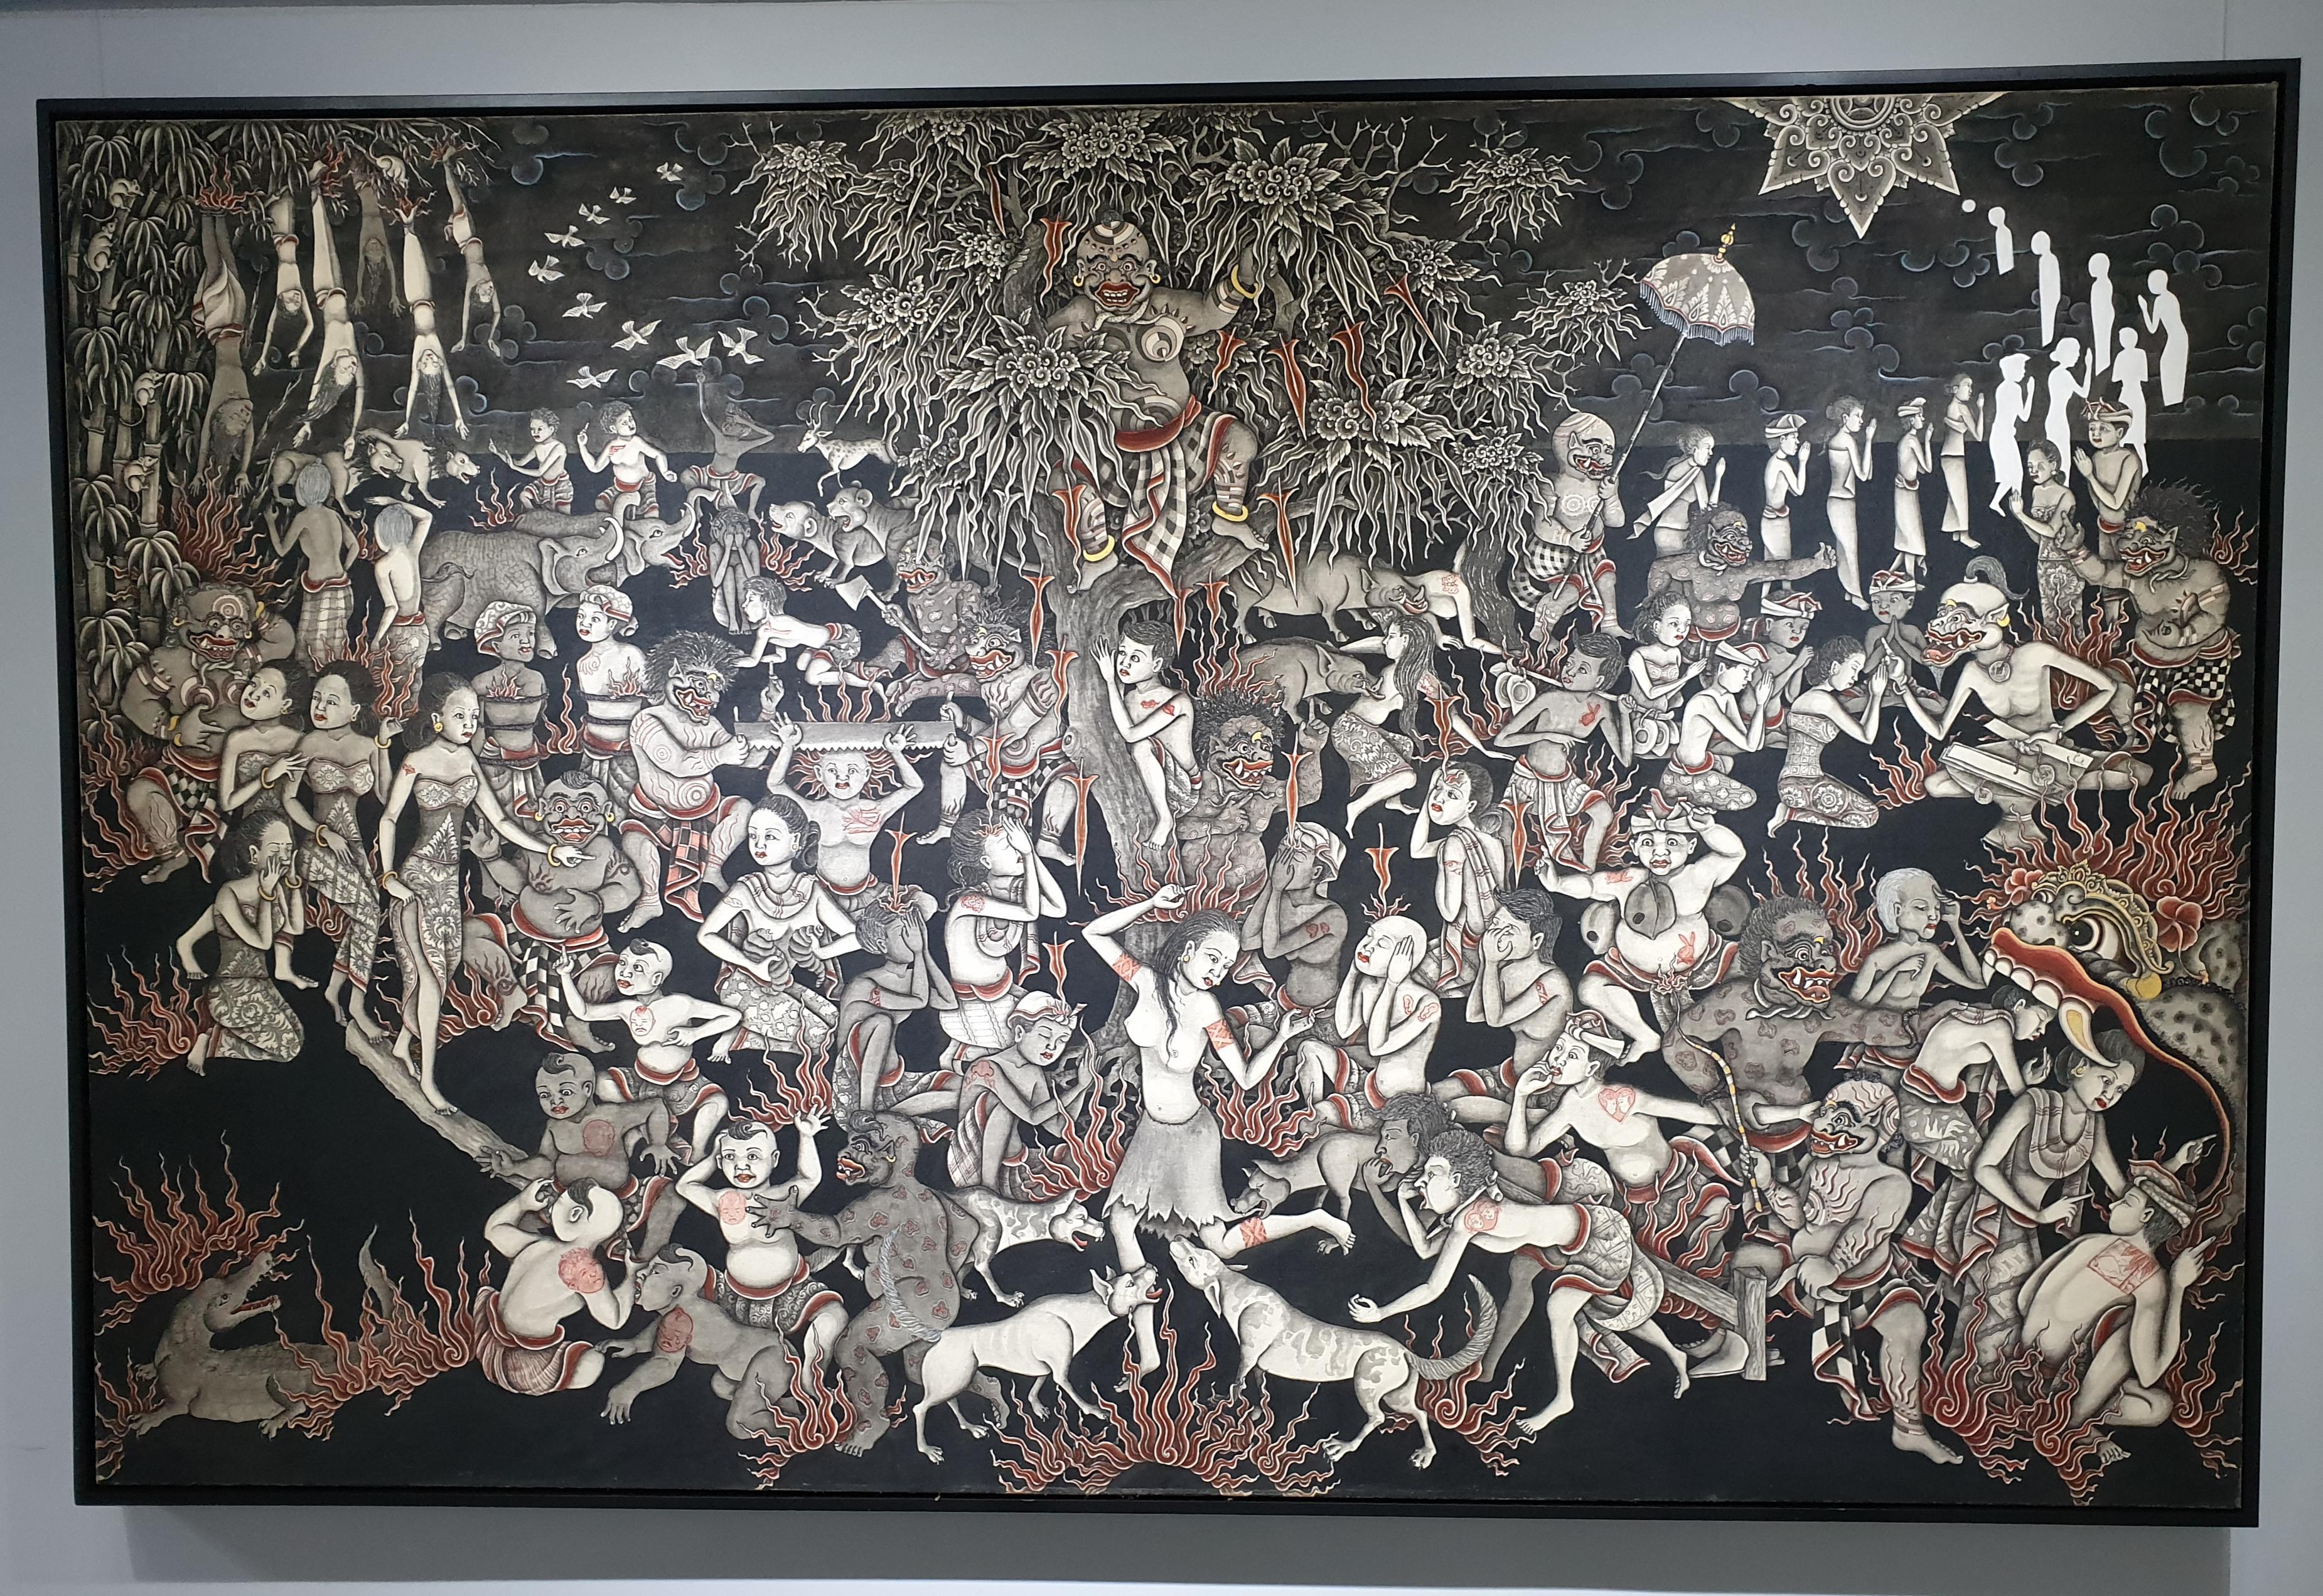 """Atma Prasangsa"" 2011 made Sujendra Image R. Horstman"